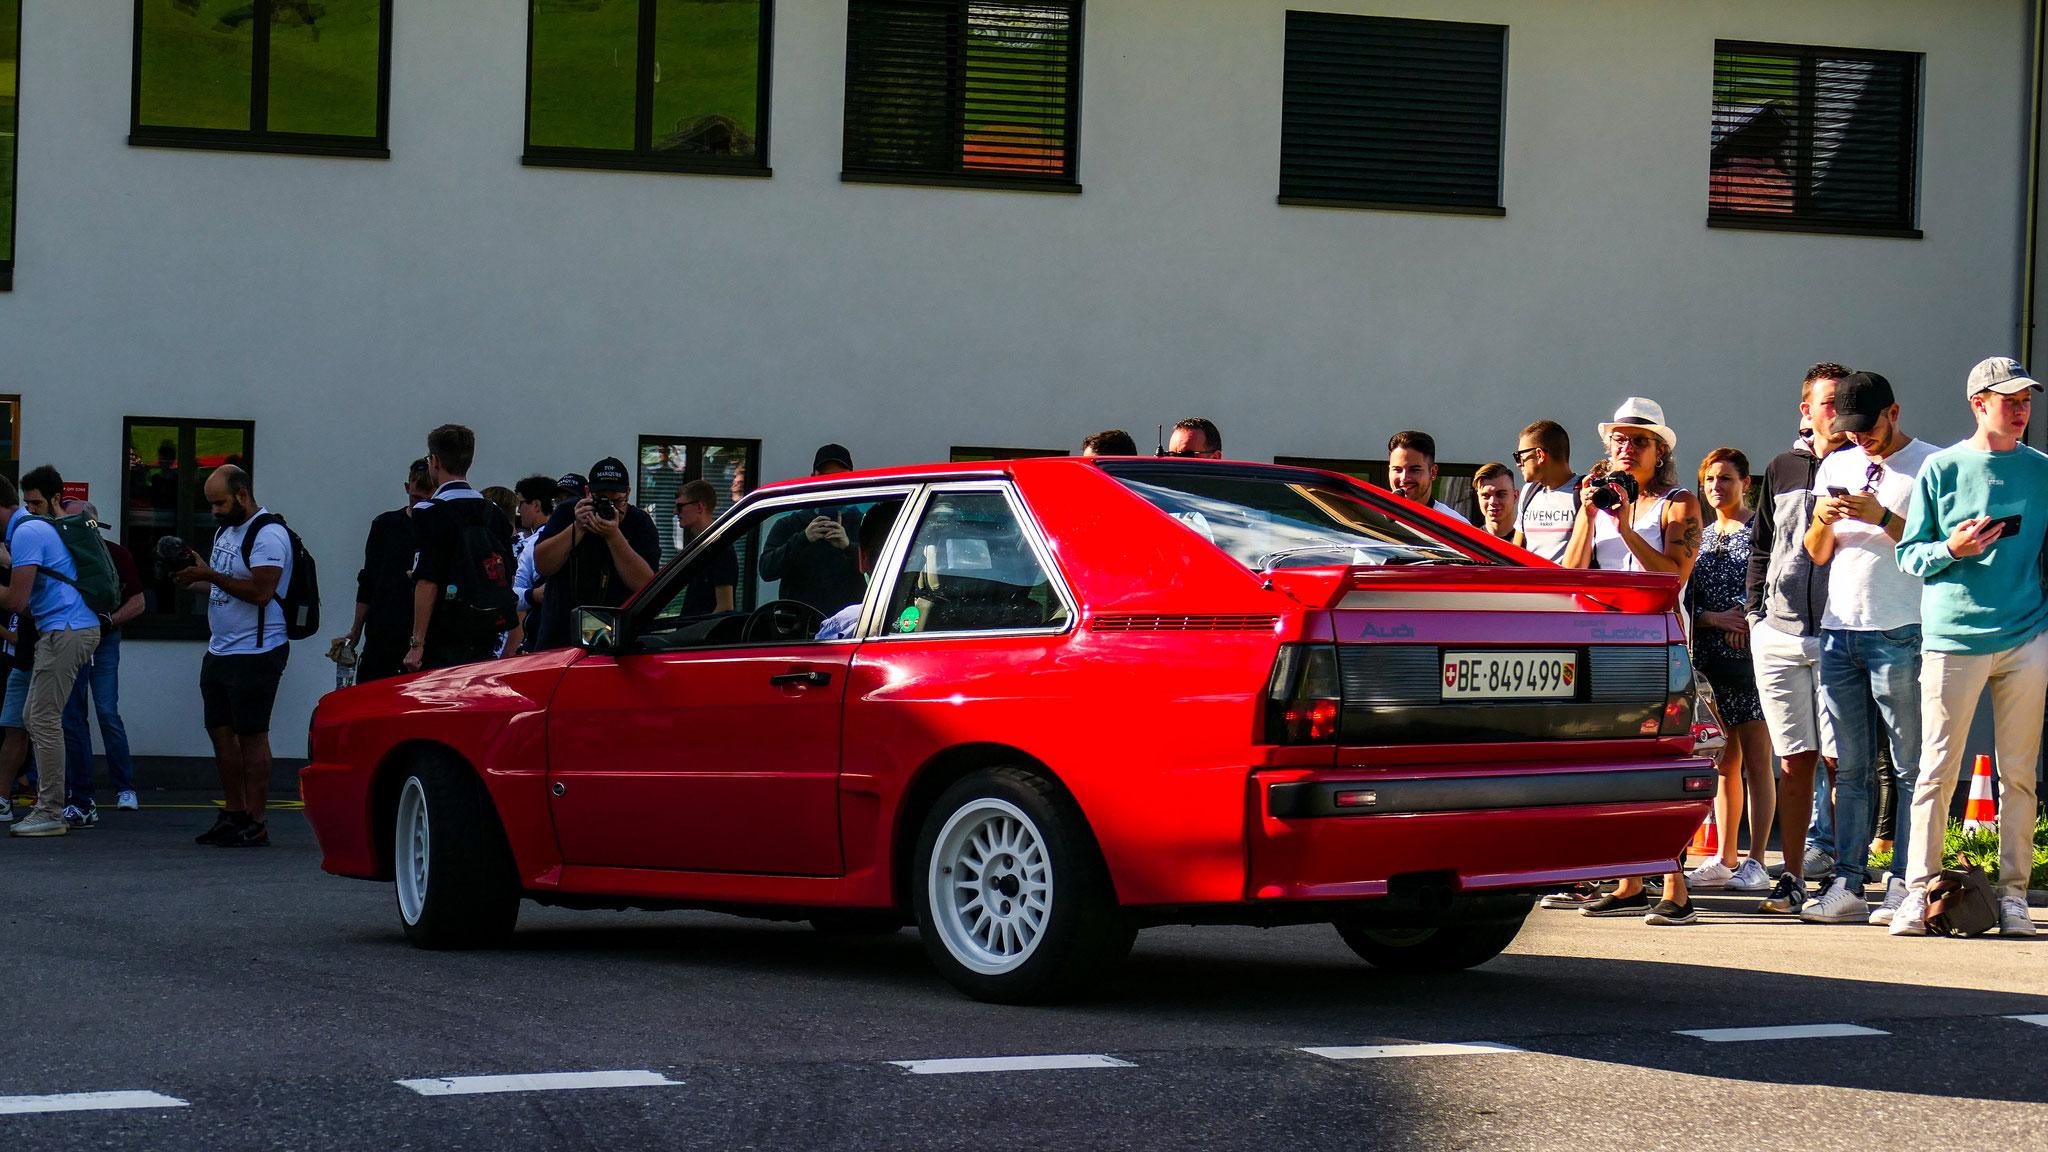 Audi Sport quattro - BE-849499 (CH)